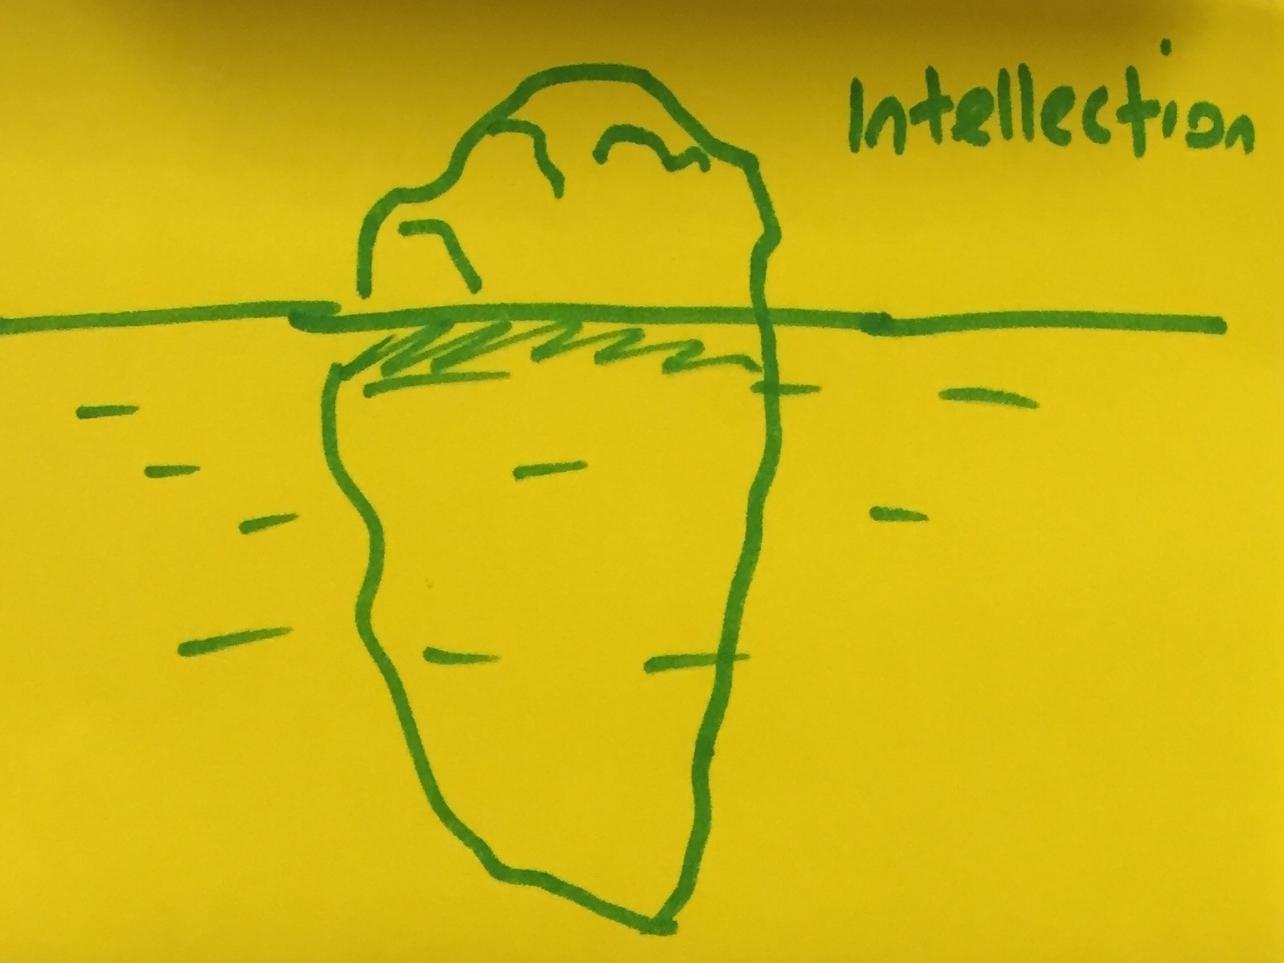 Intellection Strengthsfinder Thinkning Deep Iceberg